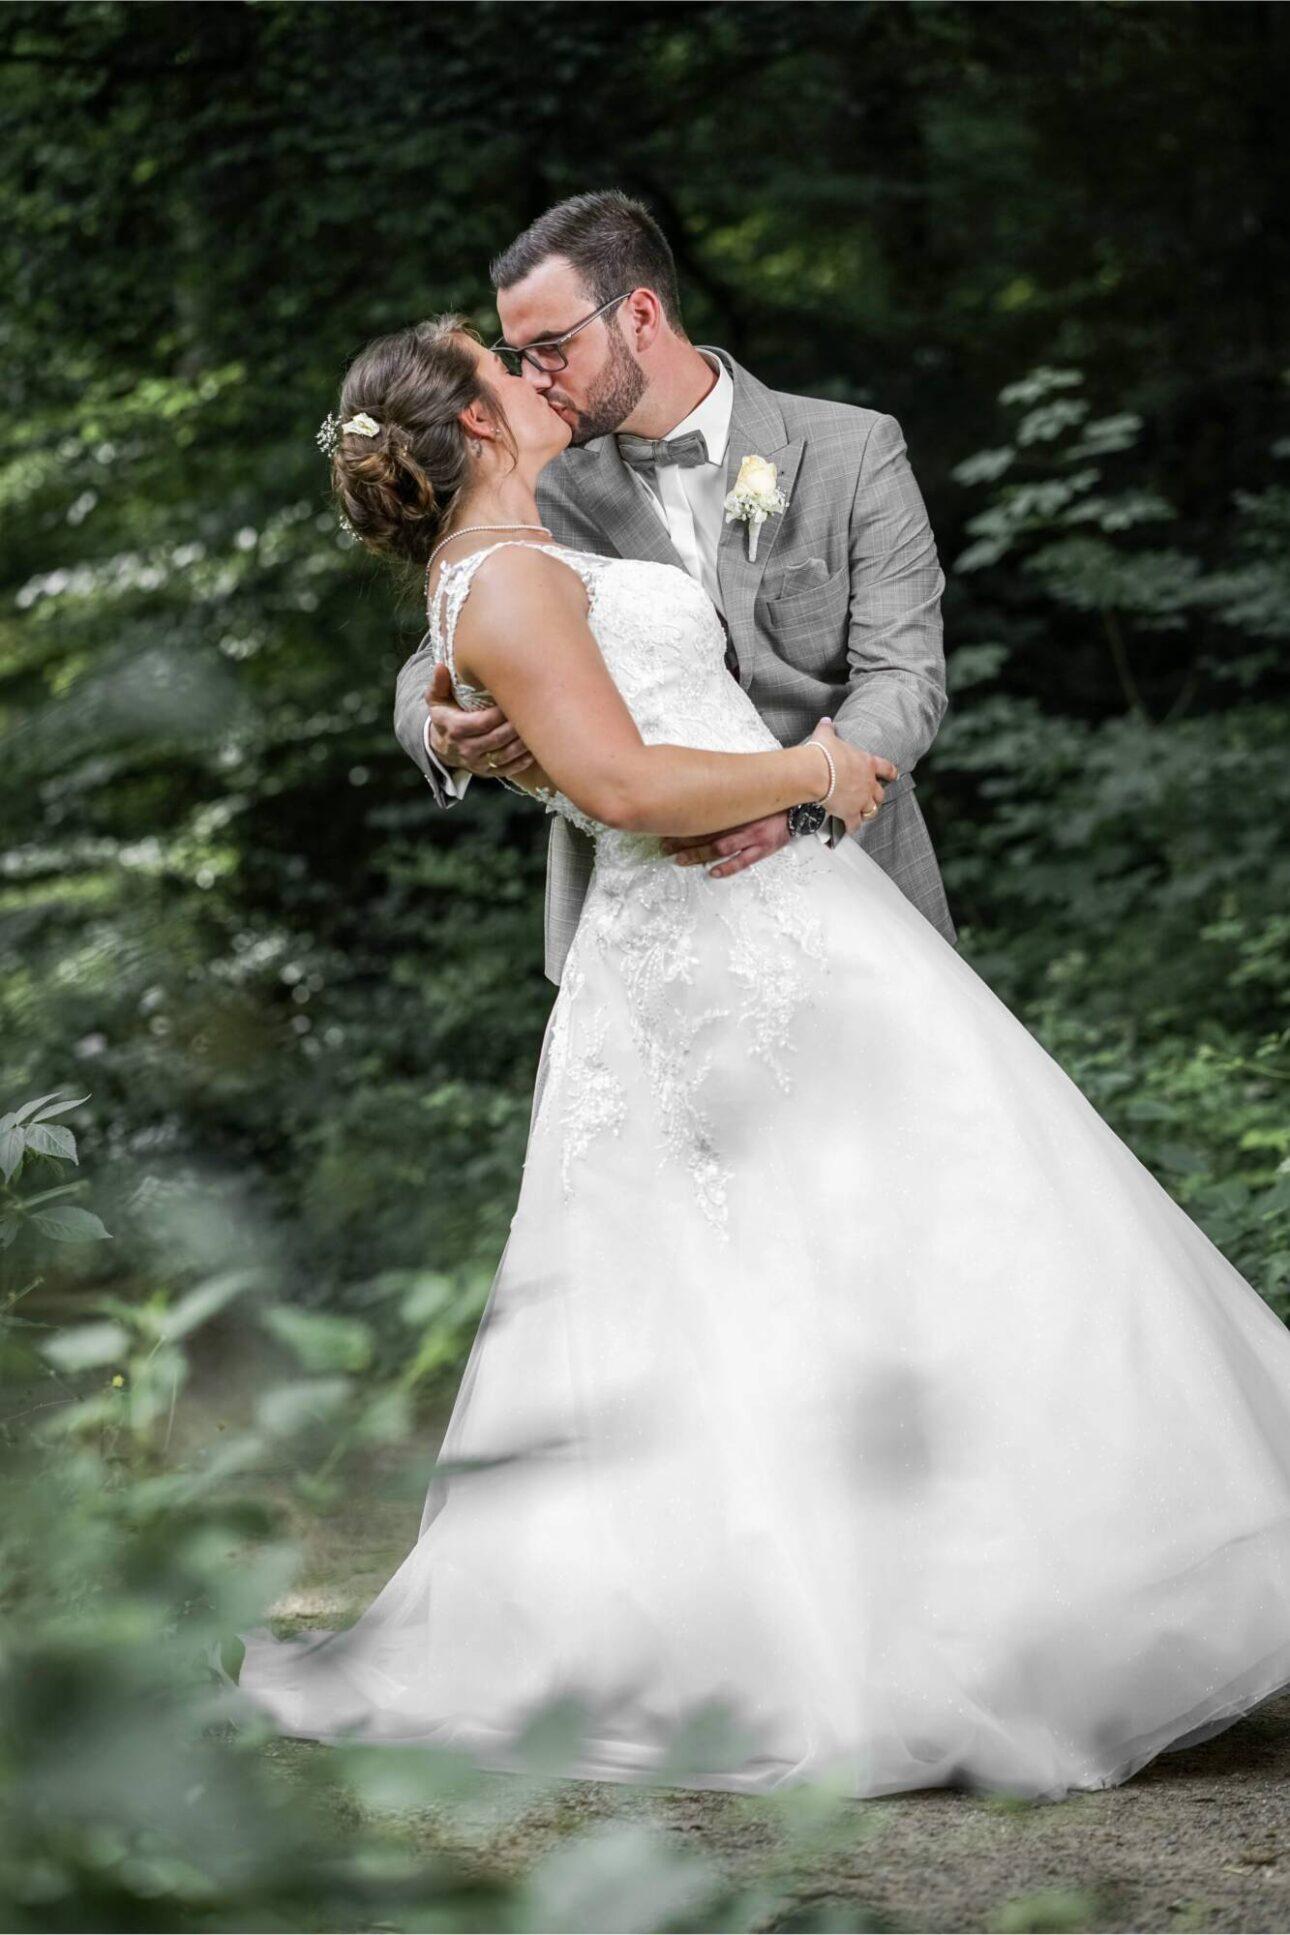 VanessaJoshua26_Hochzeitsfotograf_Koeln